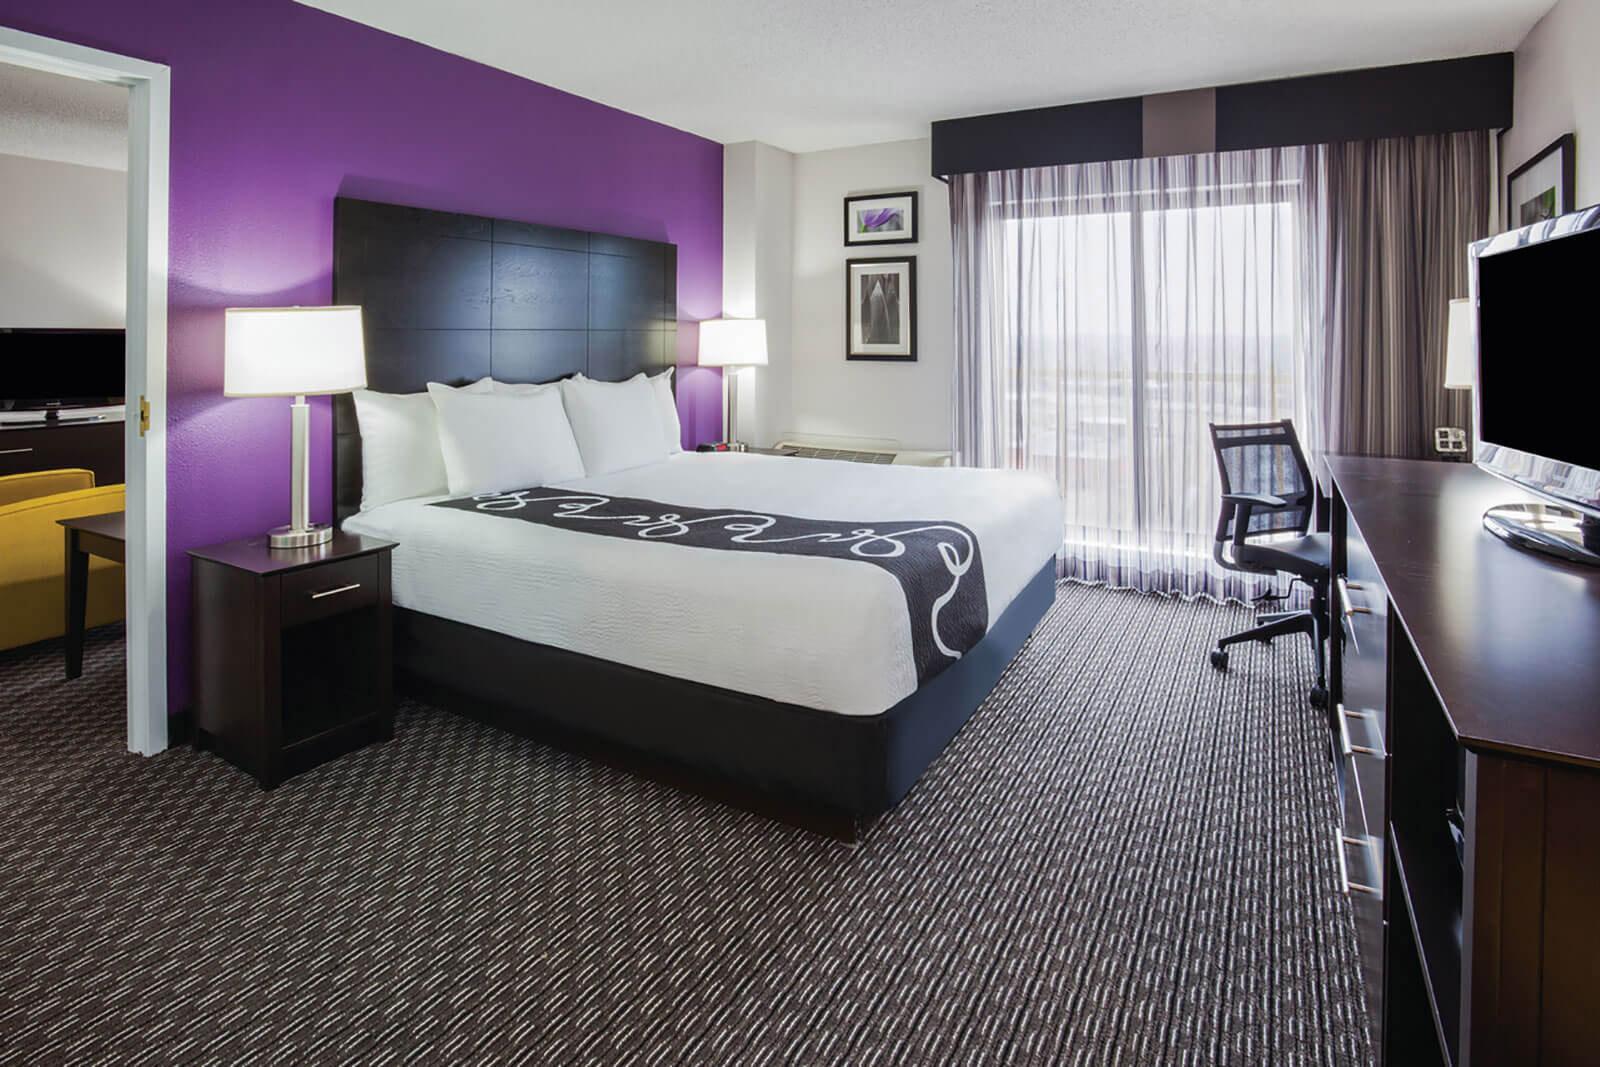 La Quinta Inn Amp Suites Bloomington West Hotels In